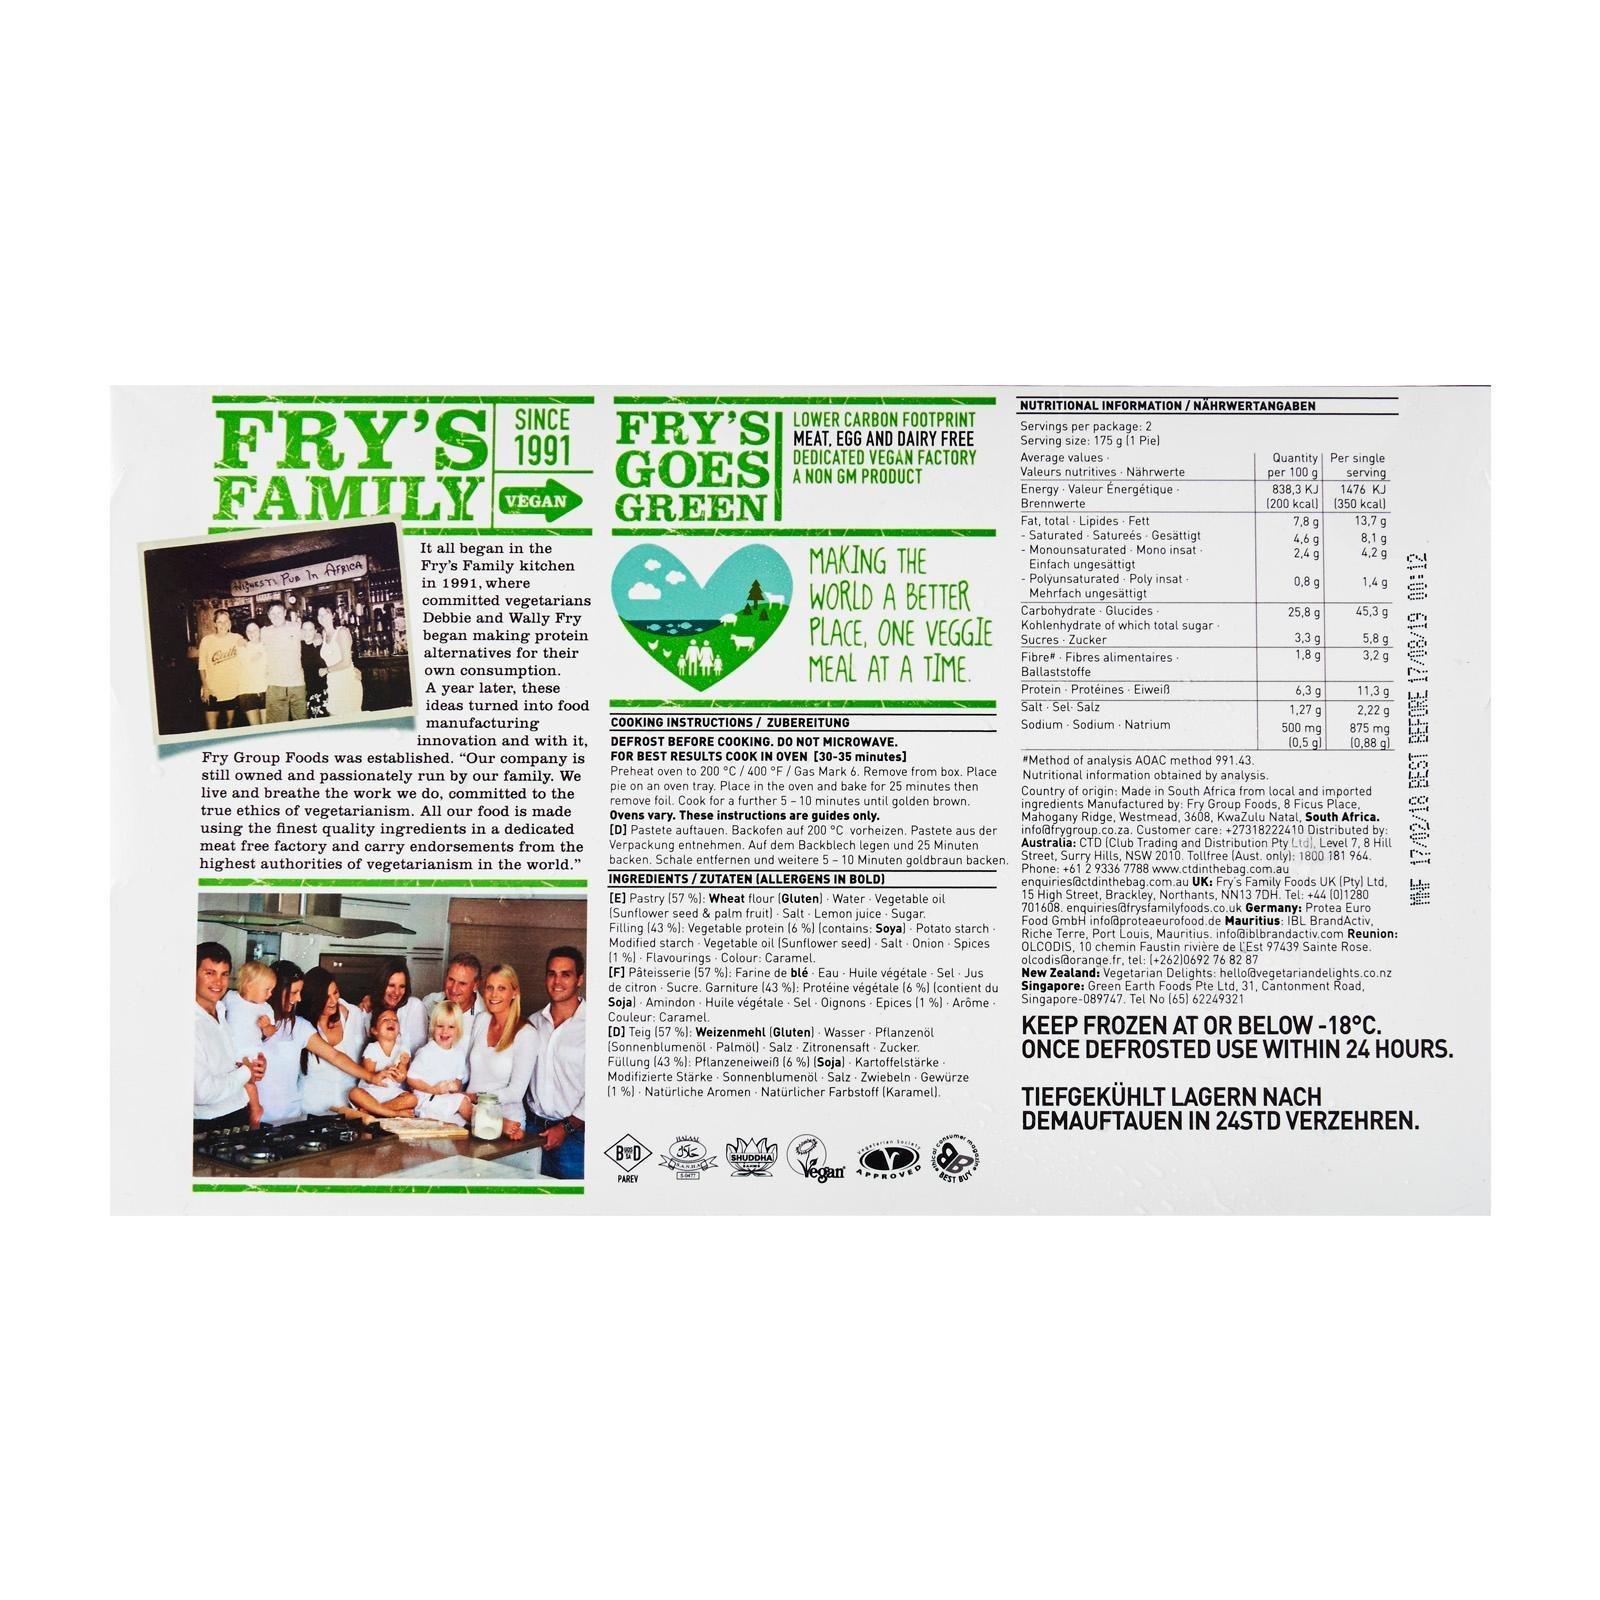 FRY'S Peeper Steak Pies | NTUC FairPrice